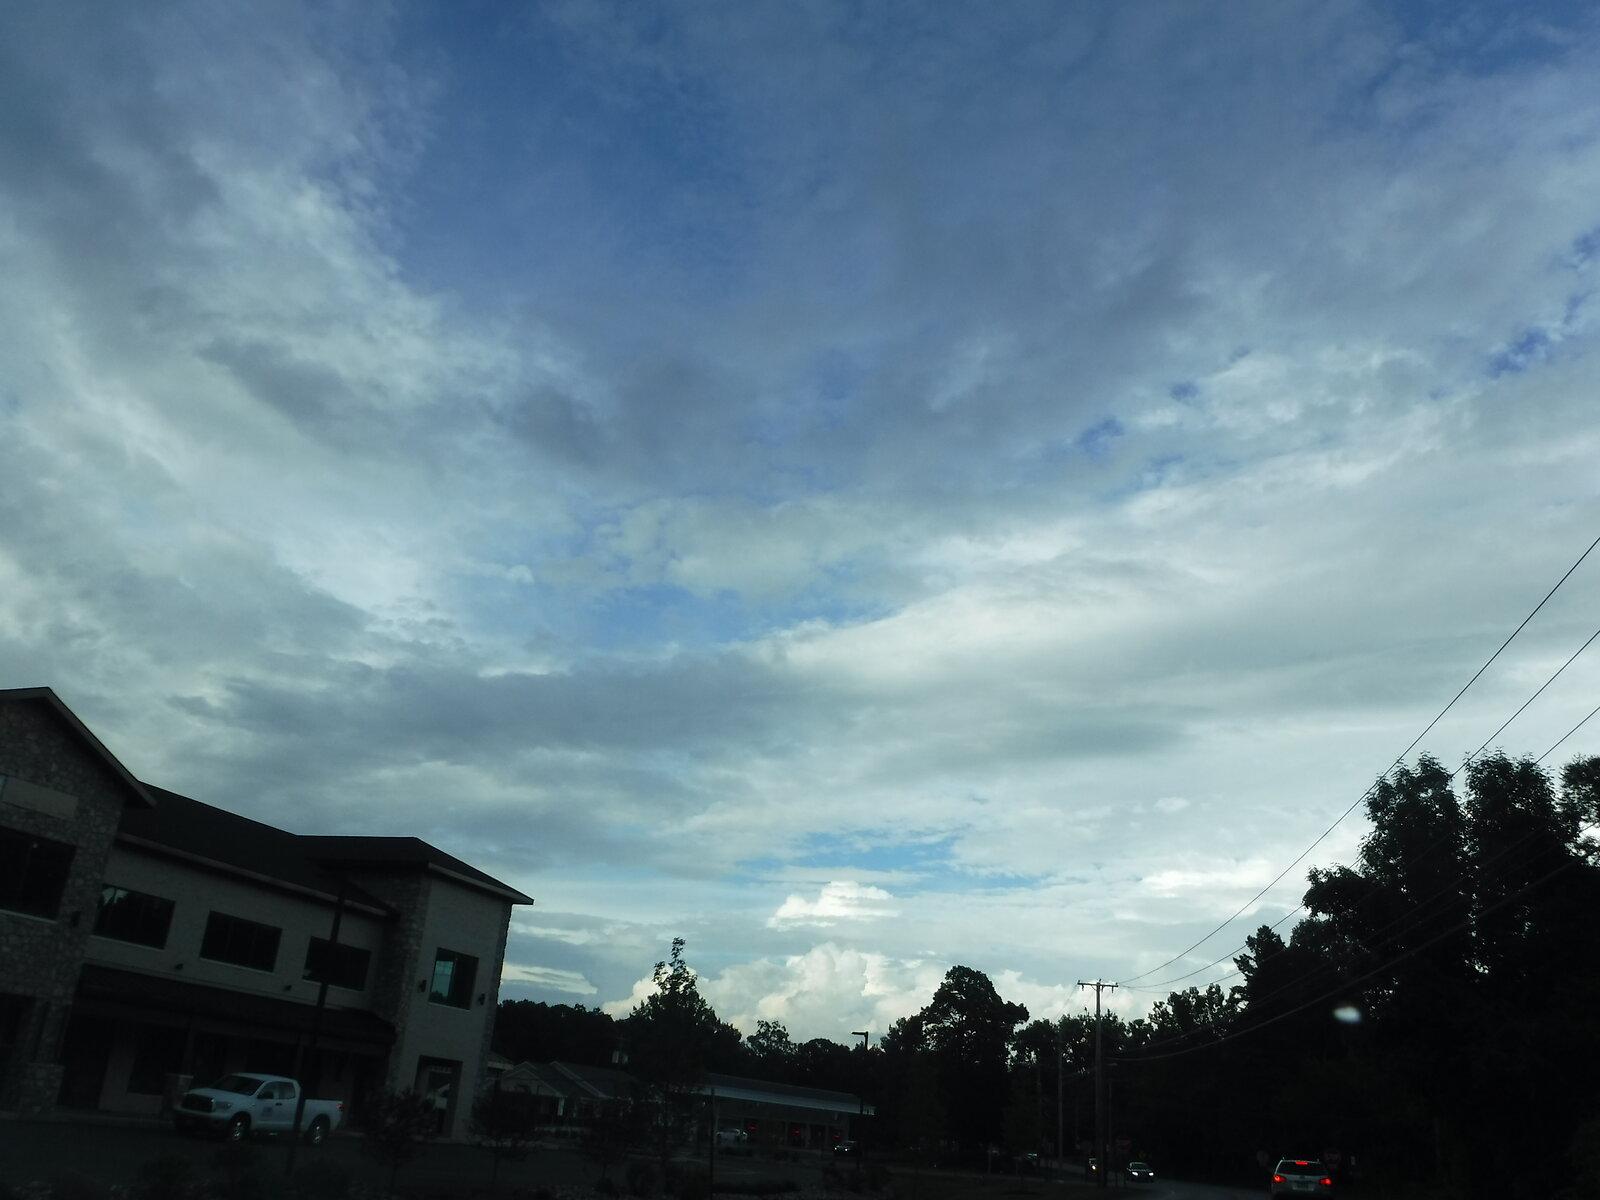 XP90 clouds 019.JPG